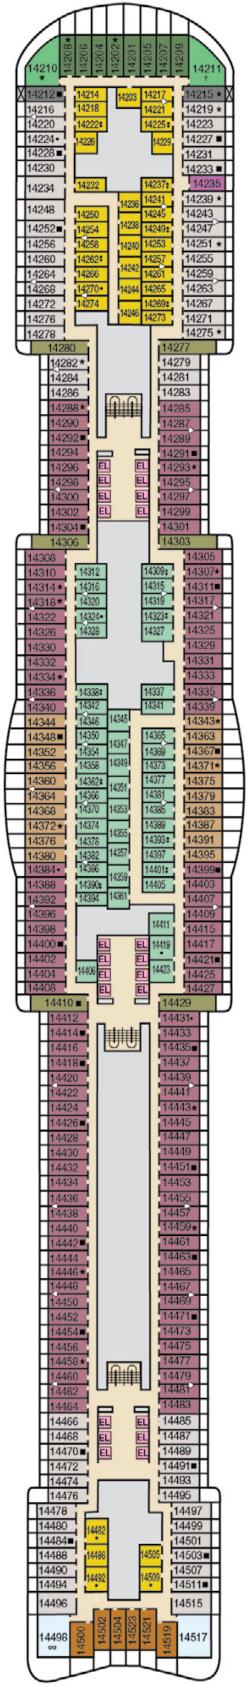 Mardi Gras Deck 14 Deck Plan